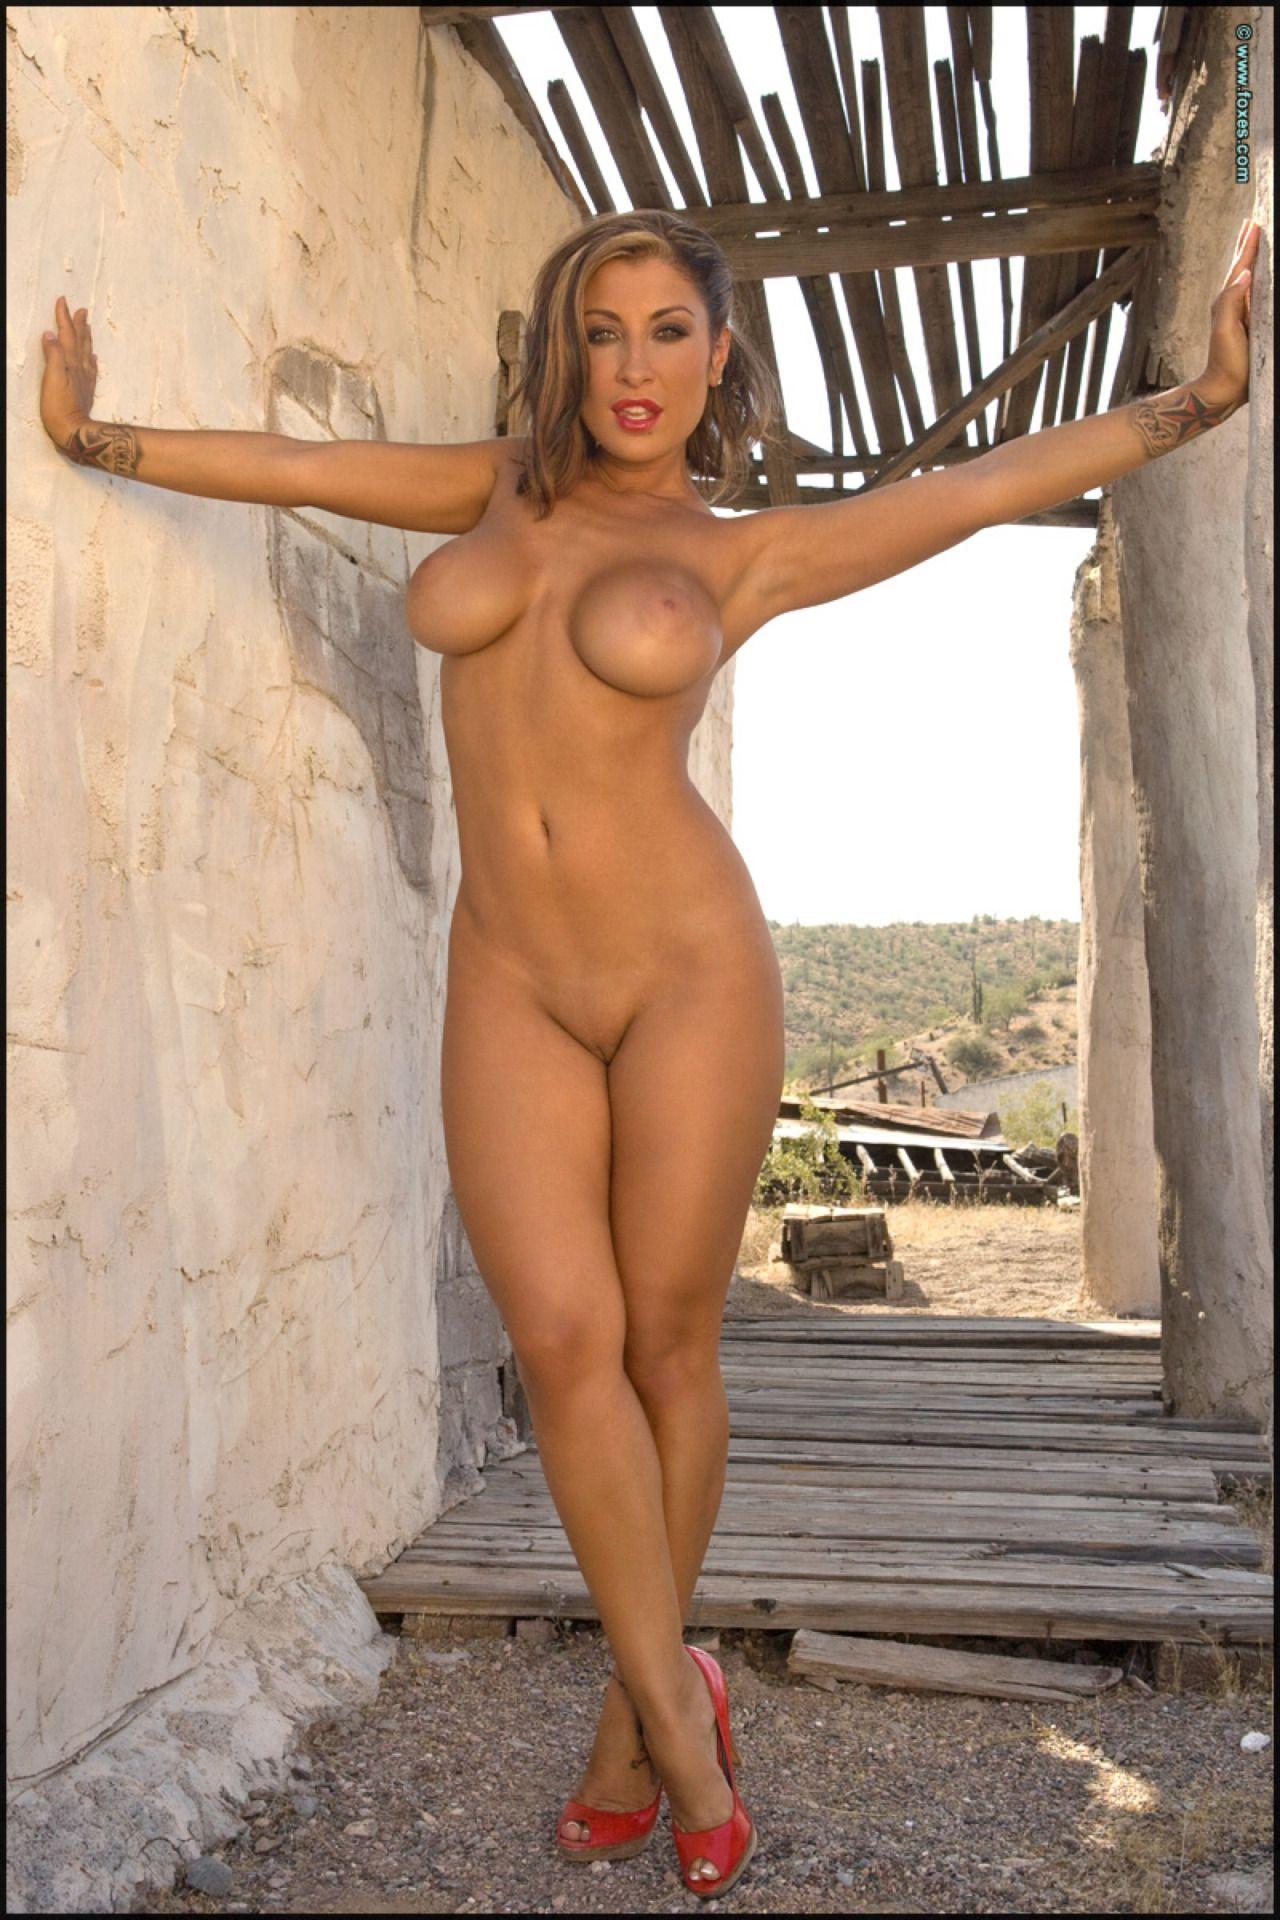 jessica canizales sex tape